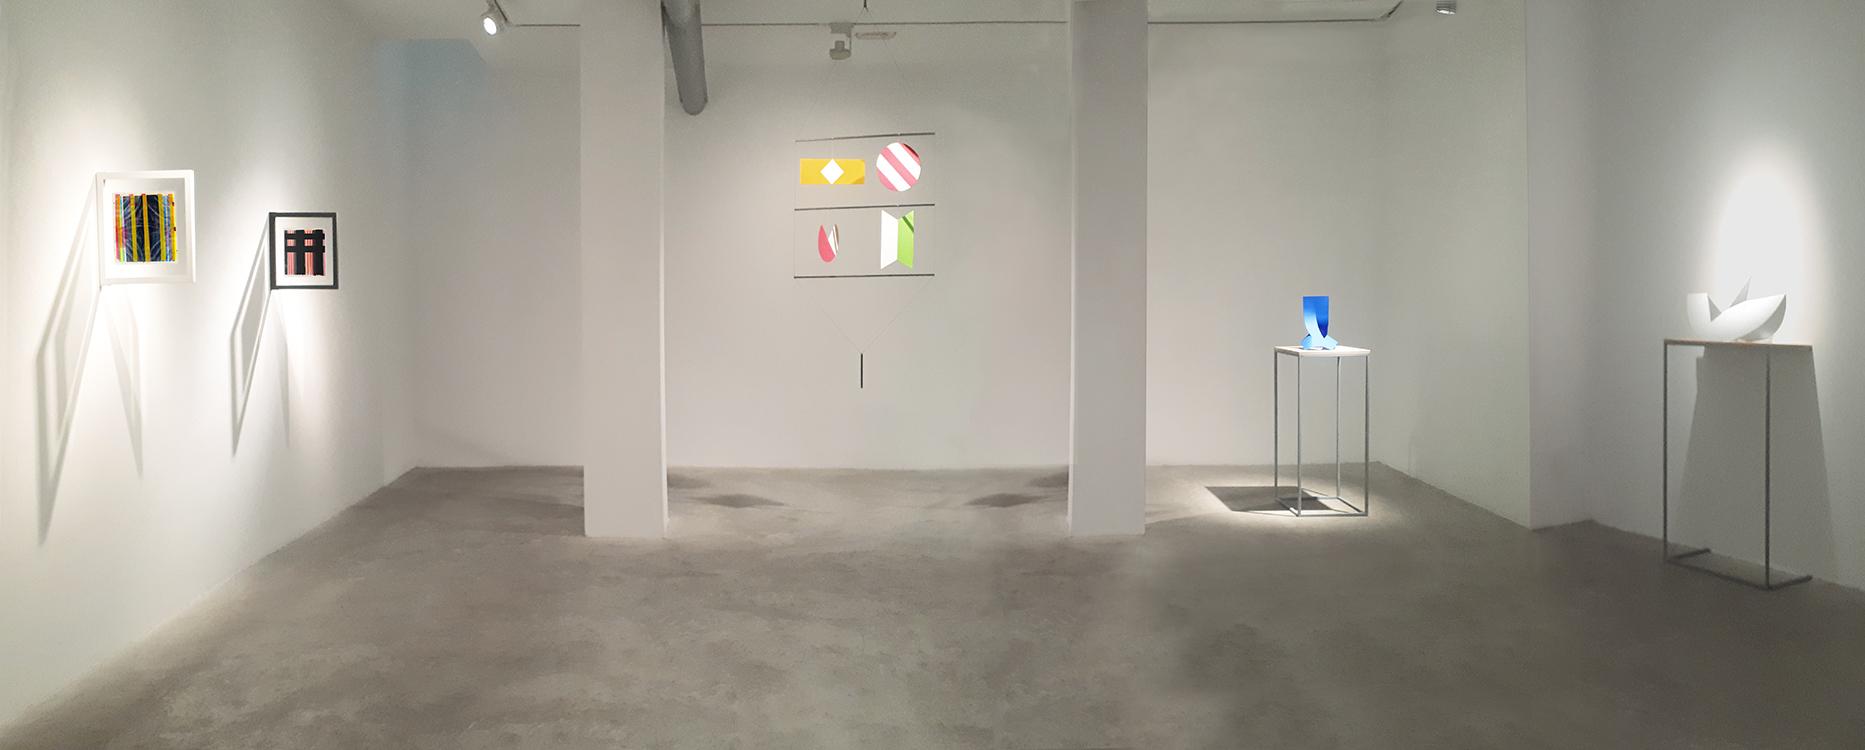 Bruno Munari__Bruno Munari__Vista exposición Aural_Alicante_2020